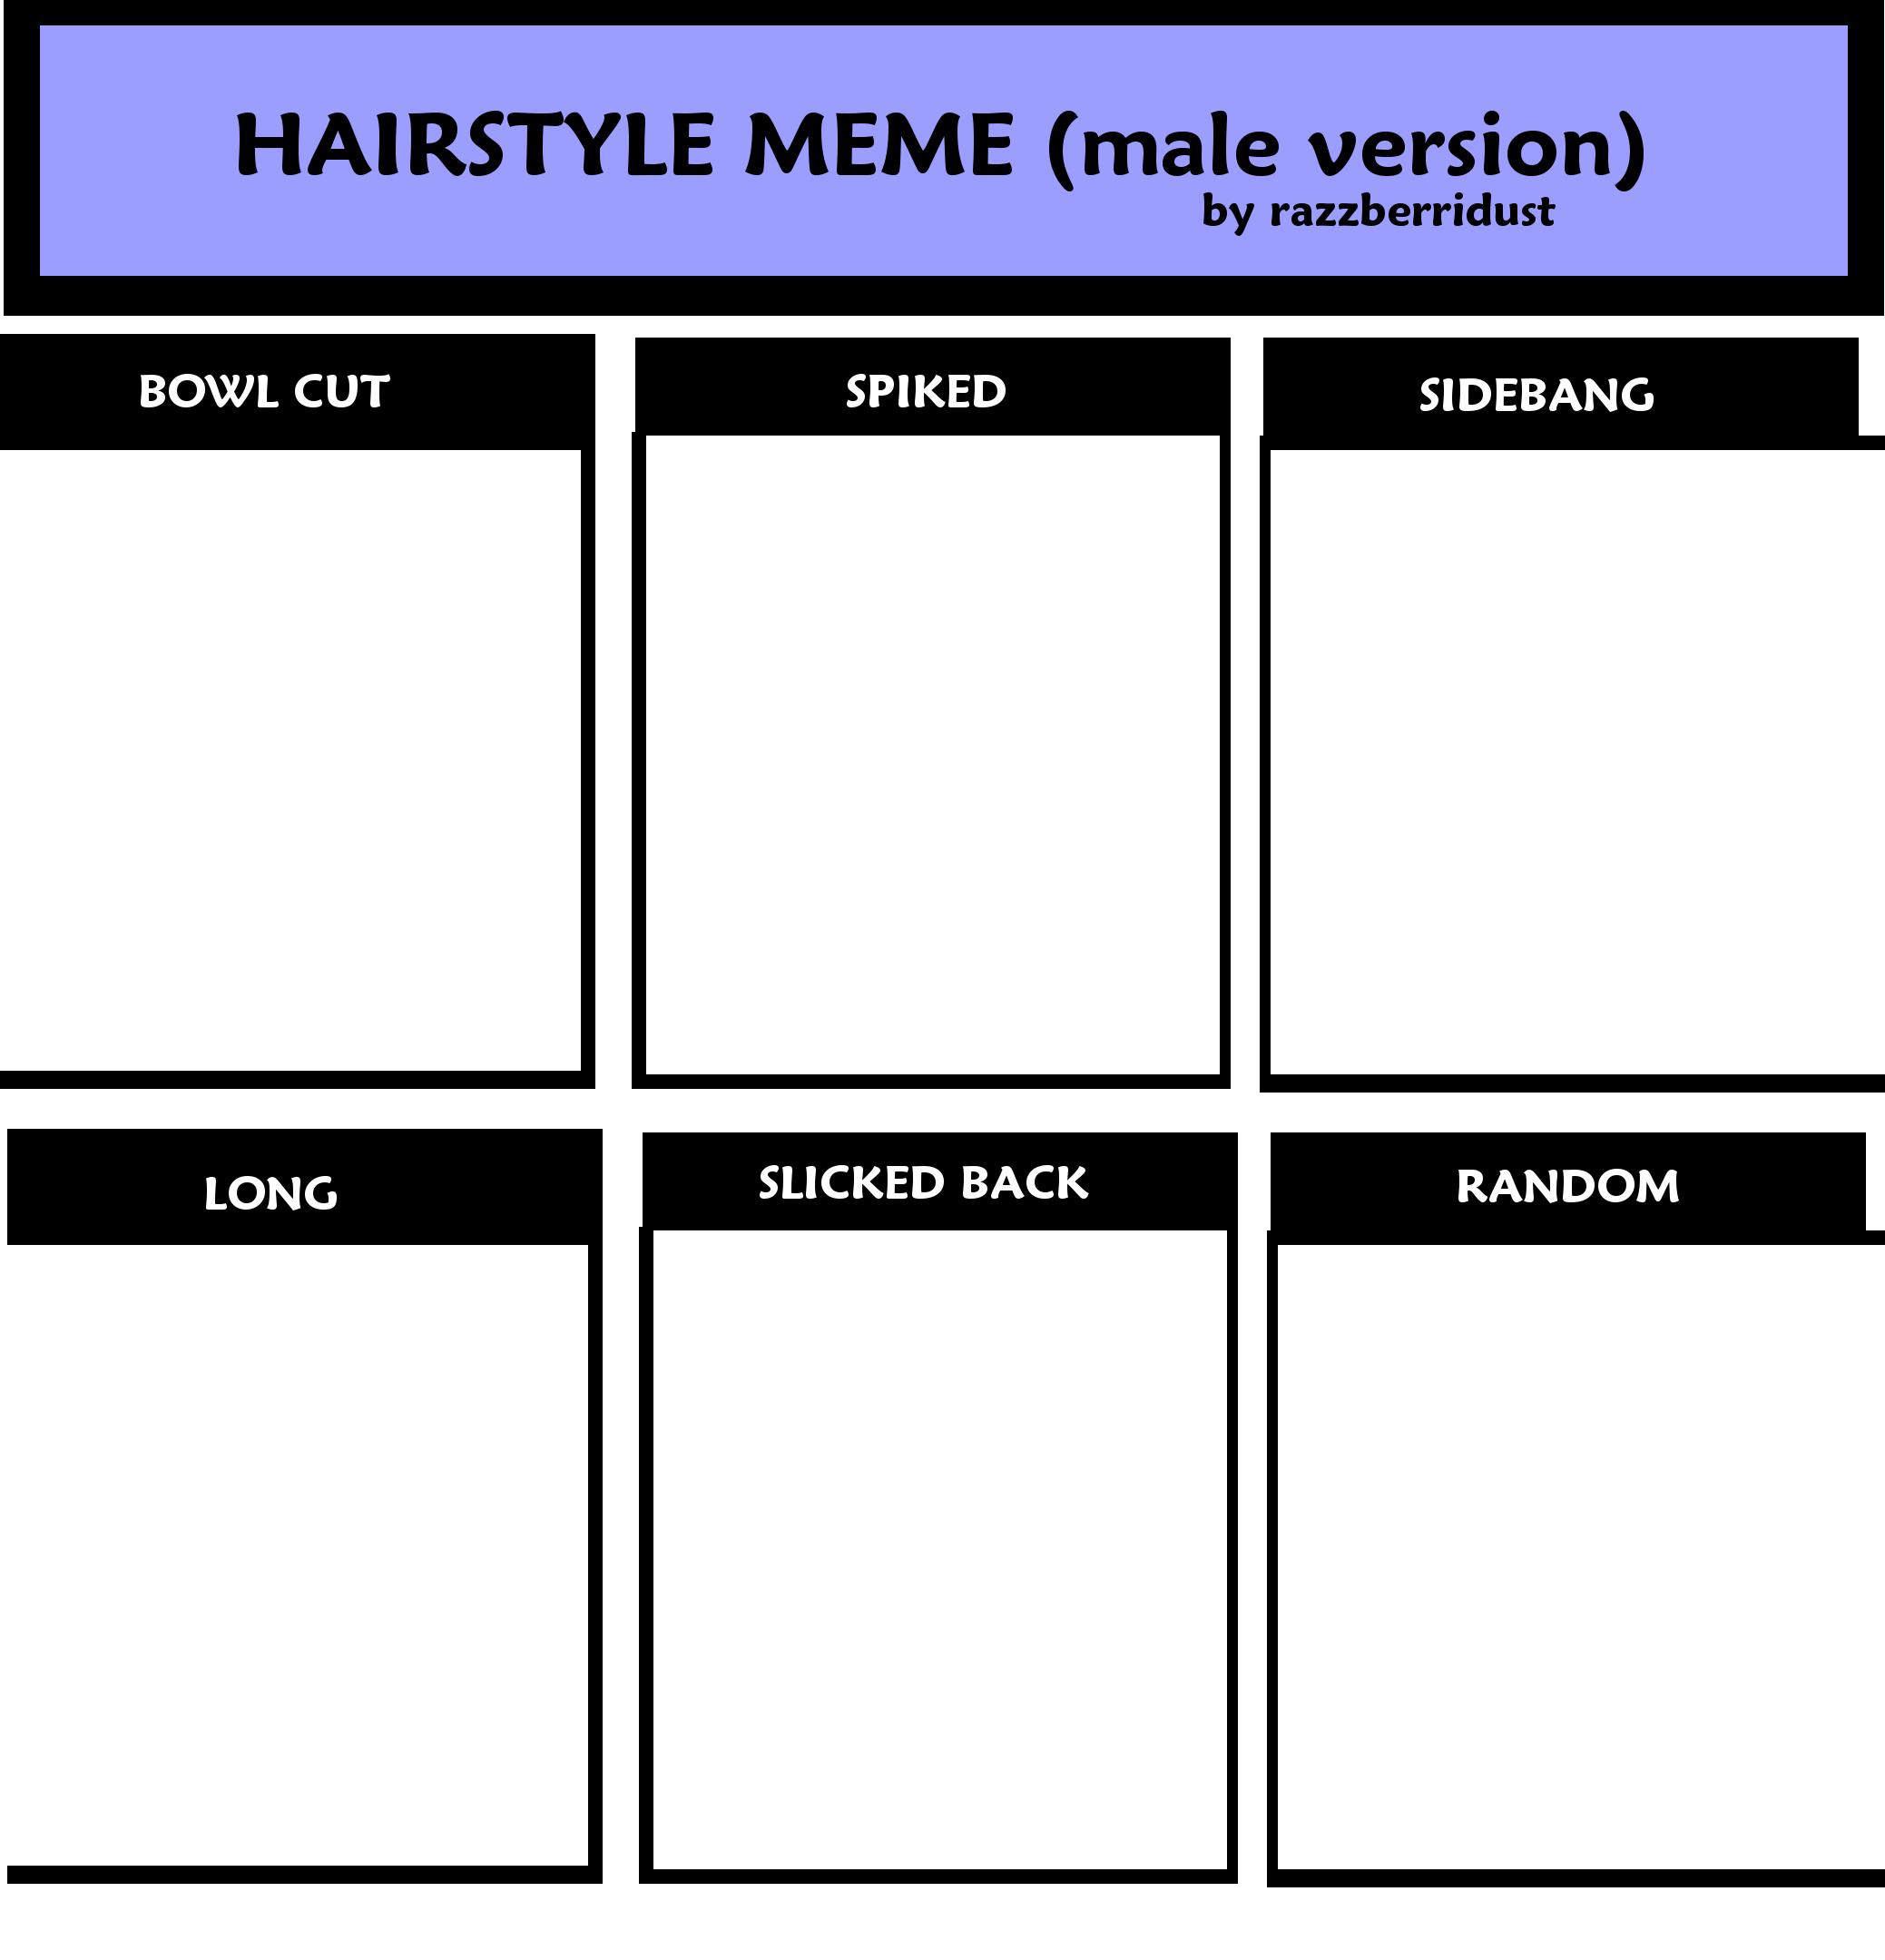 Hairstyle Meme Male Version By Razzberridust On Deviantart